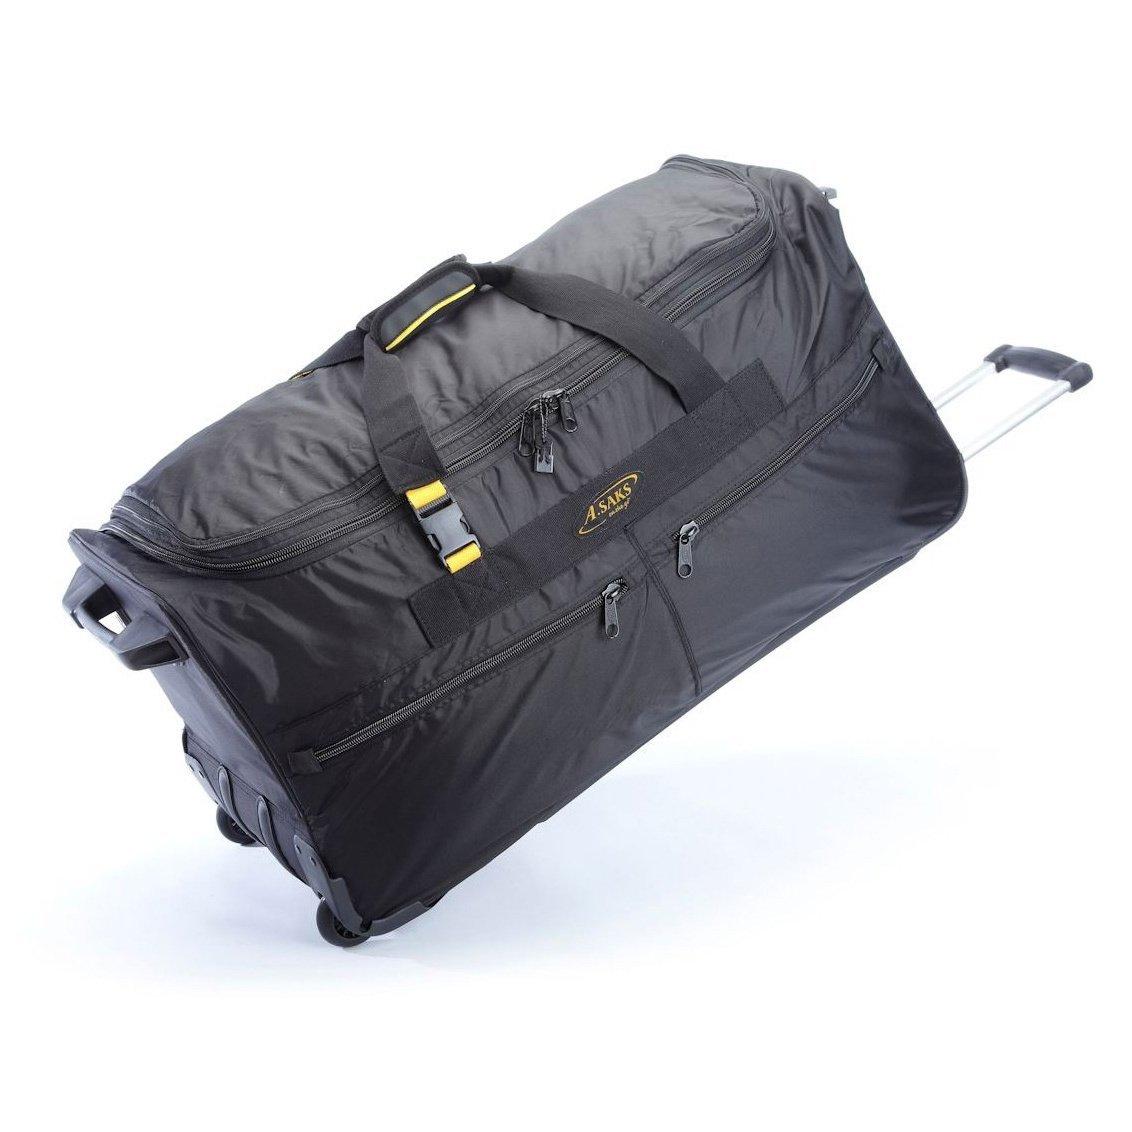 A。Saksスポーツ31 -インチ拡張可能なローリングUpright Travel Duffelバッグ   B01FA9E37G